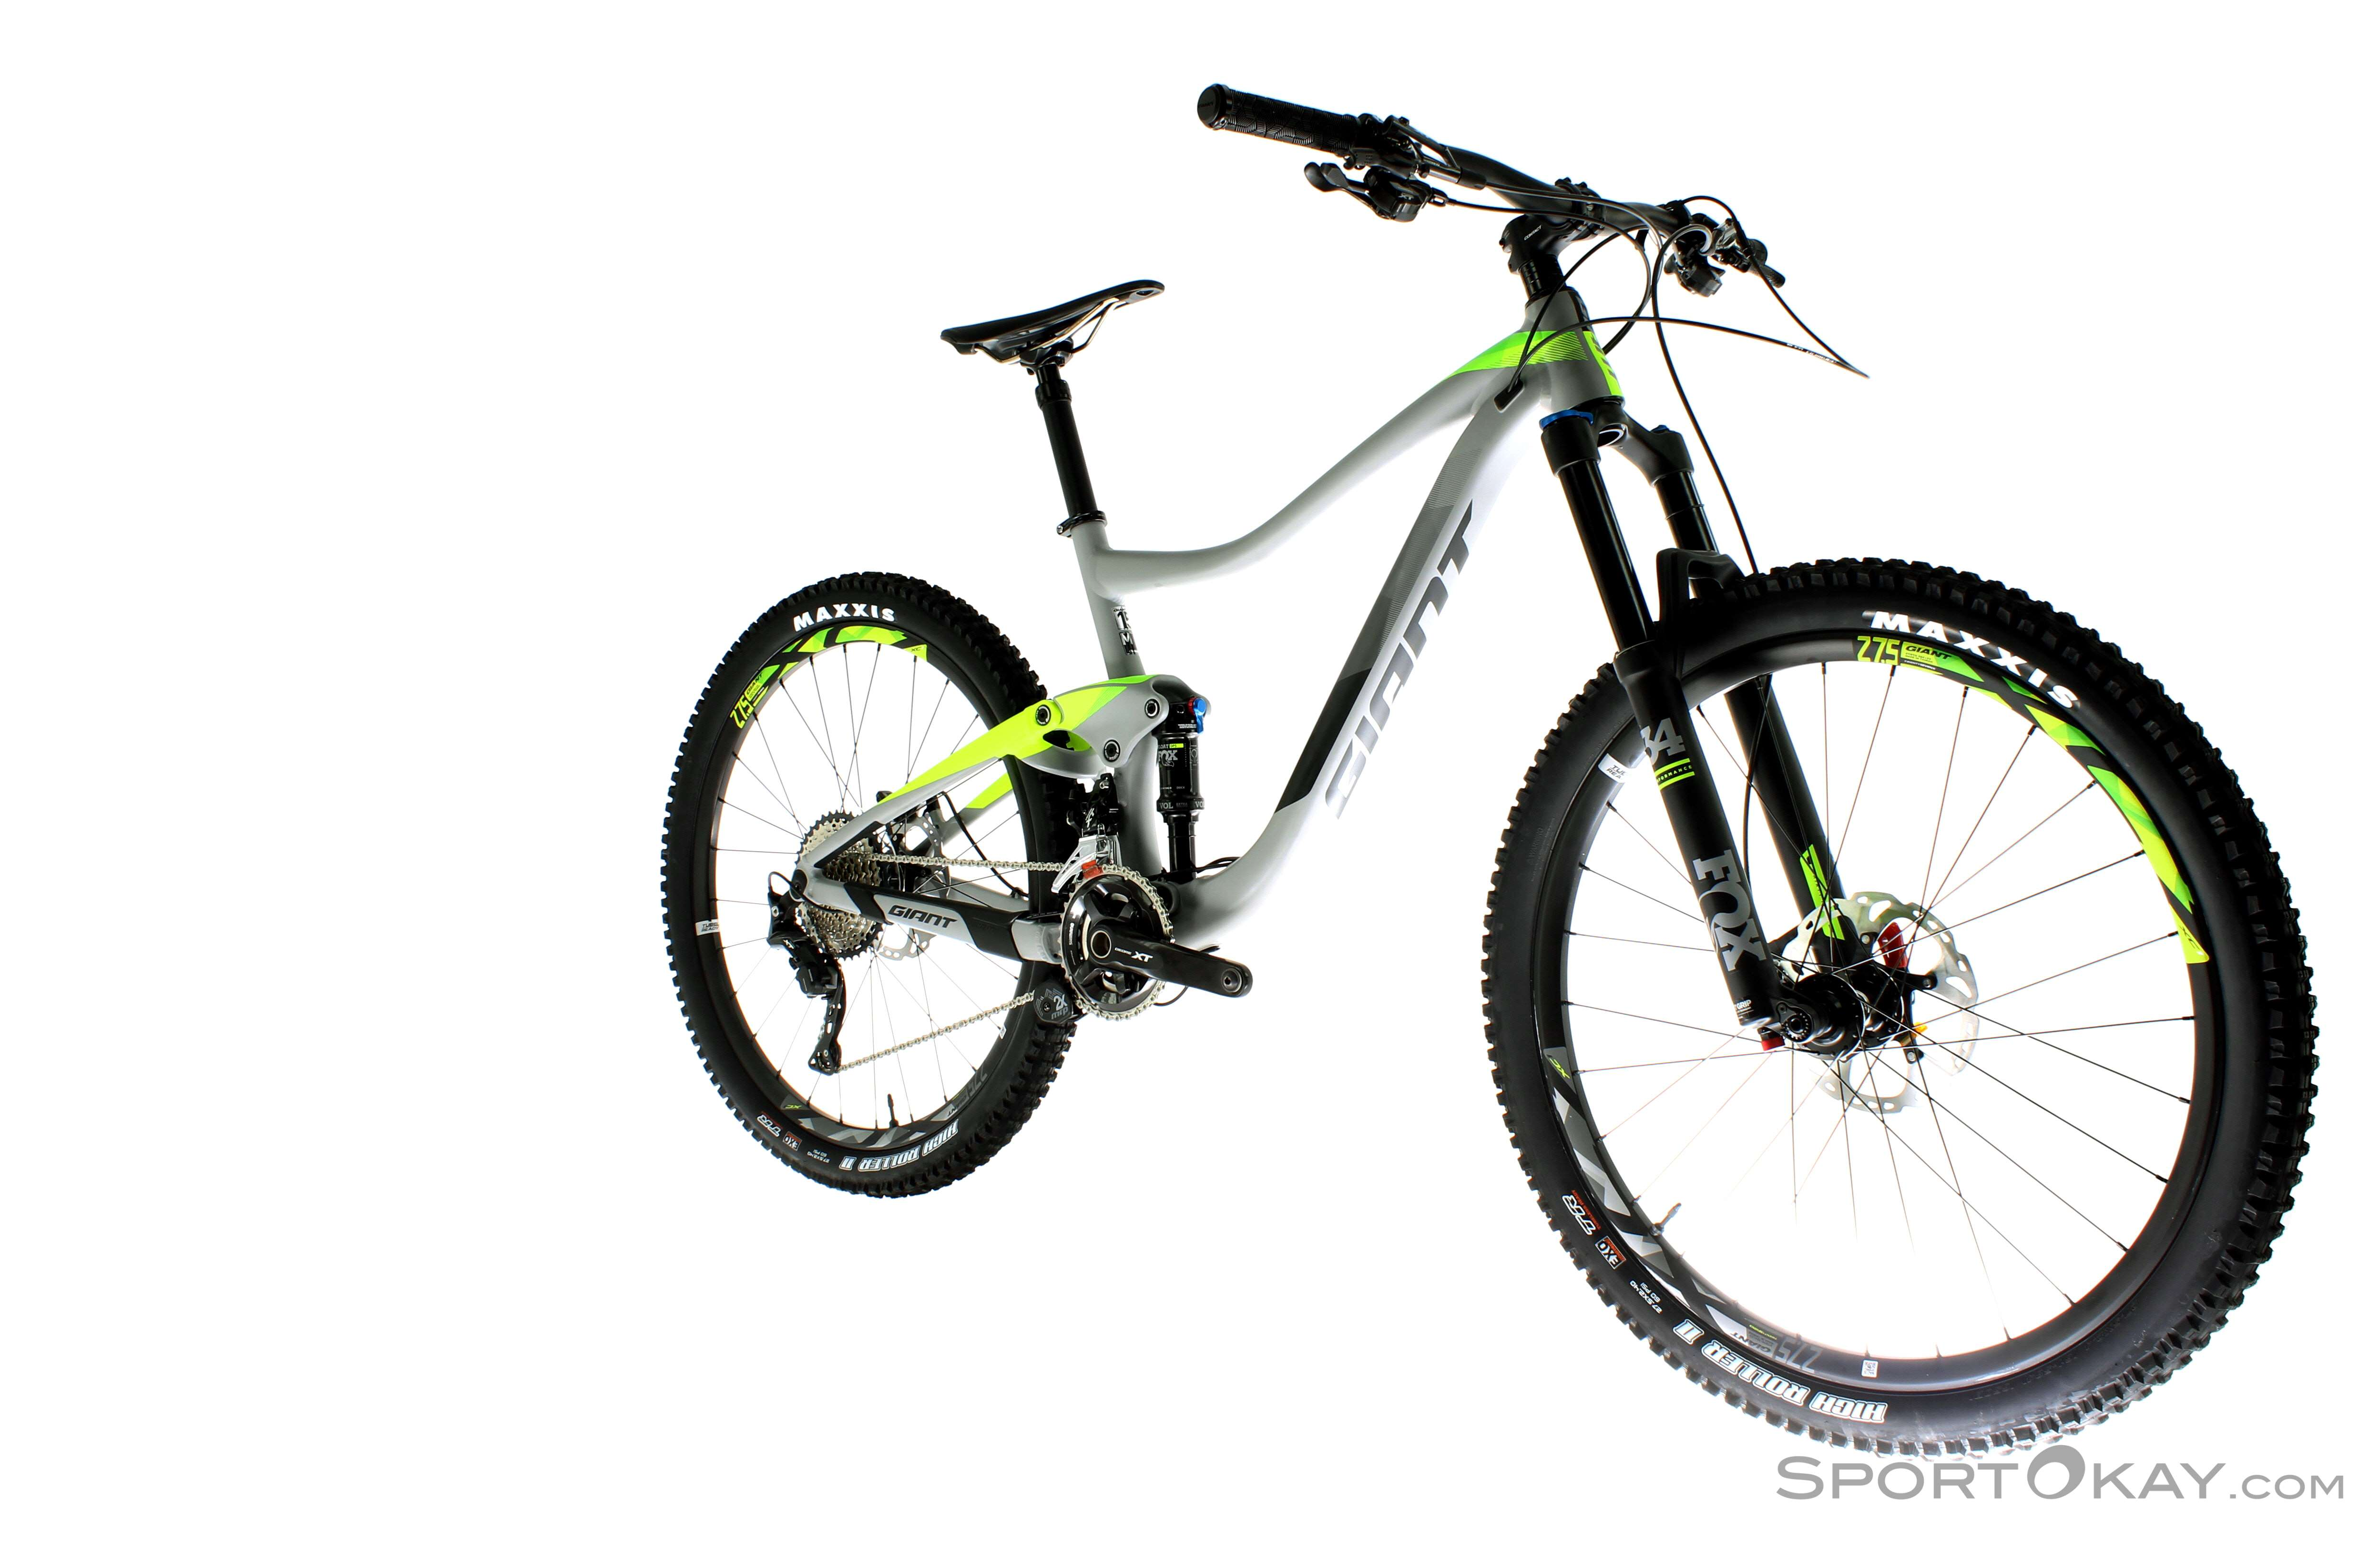 Giant Giant Trance 1 5 GE 2018 All Mountain Bike